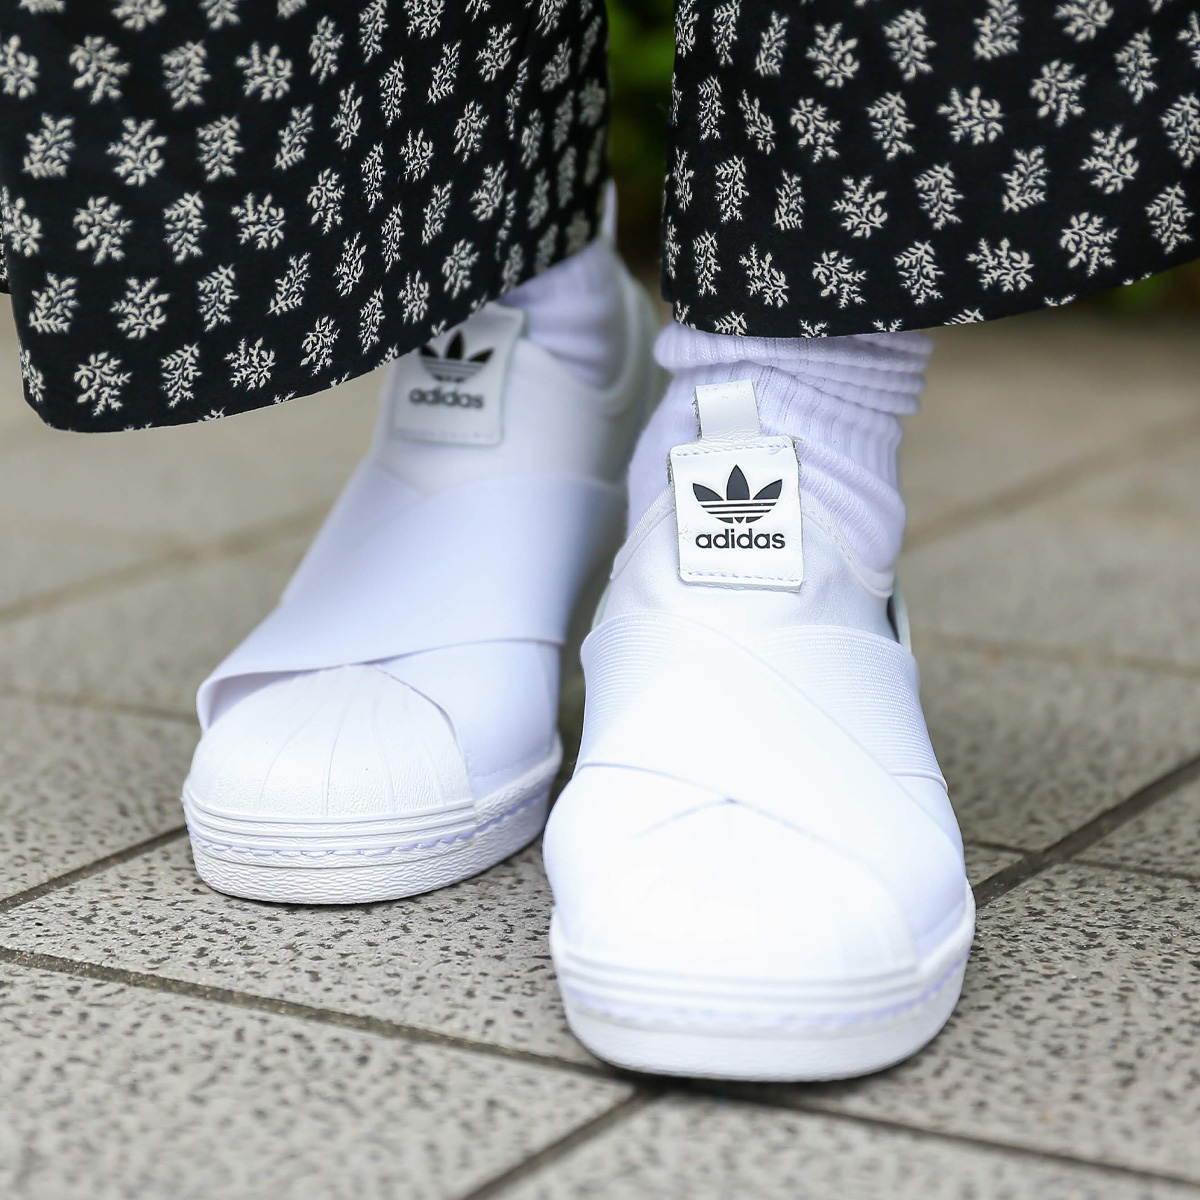 adidas Originals SUPER STAR SLIP ON W (Adidas originals superstar slip-on)  RUNNING WHITE/RUNNING WHITE/CORE BLACK 19FW-I